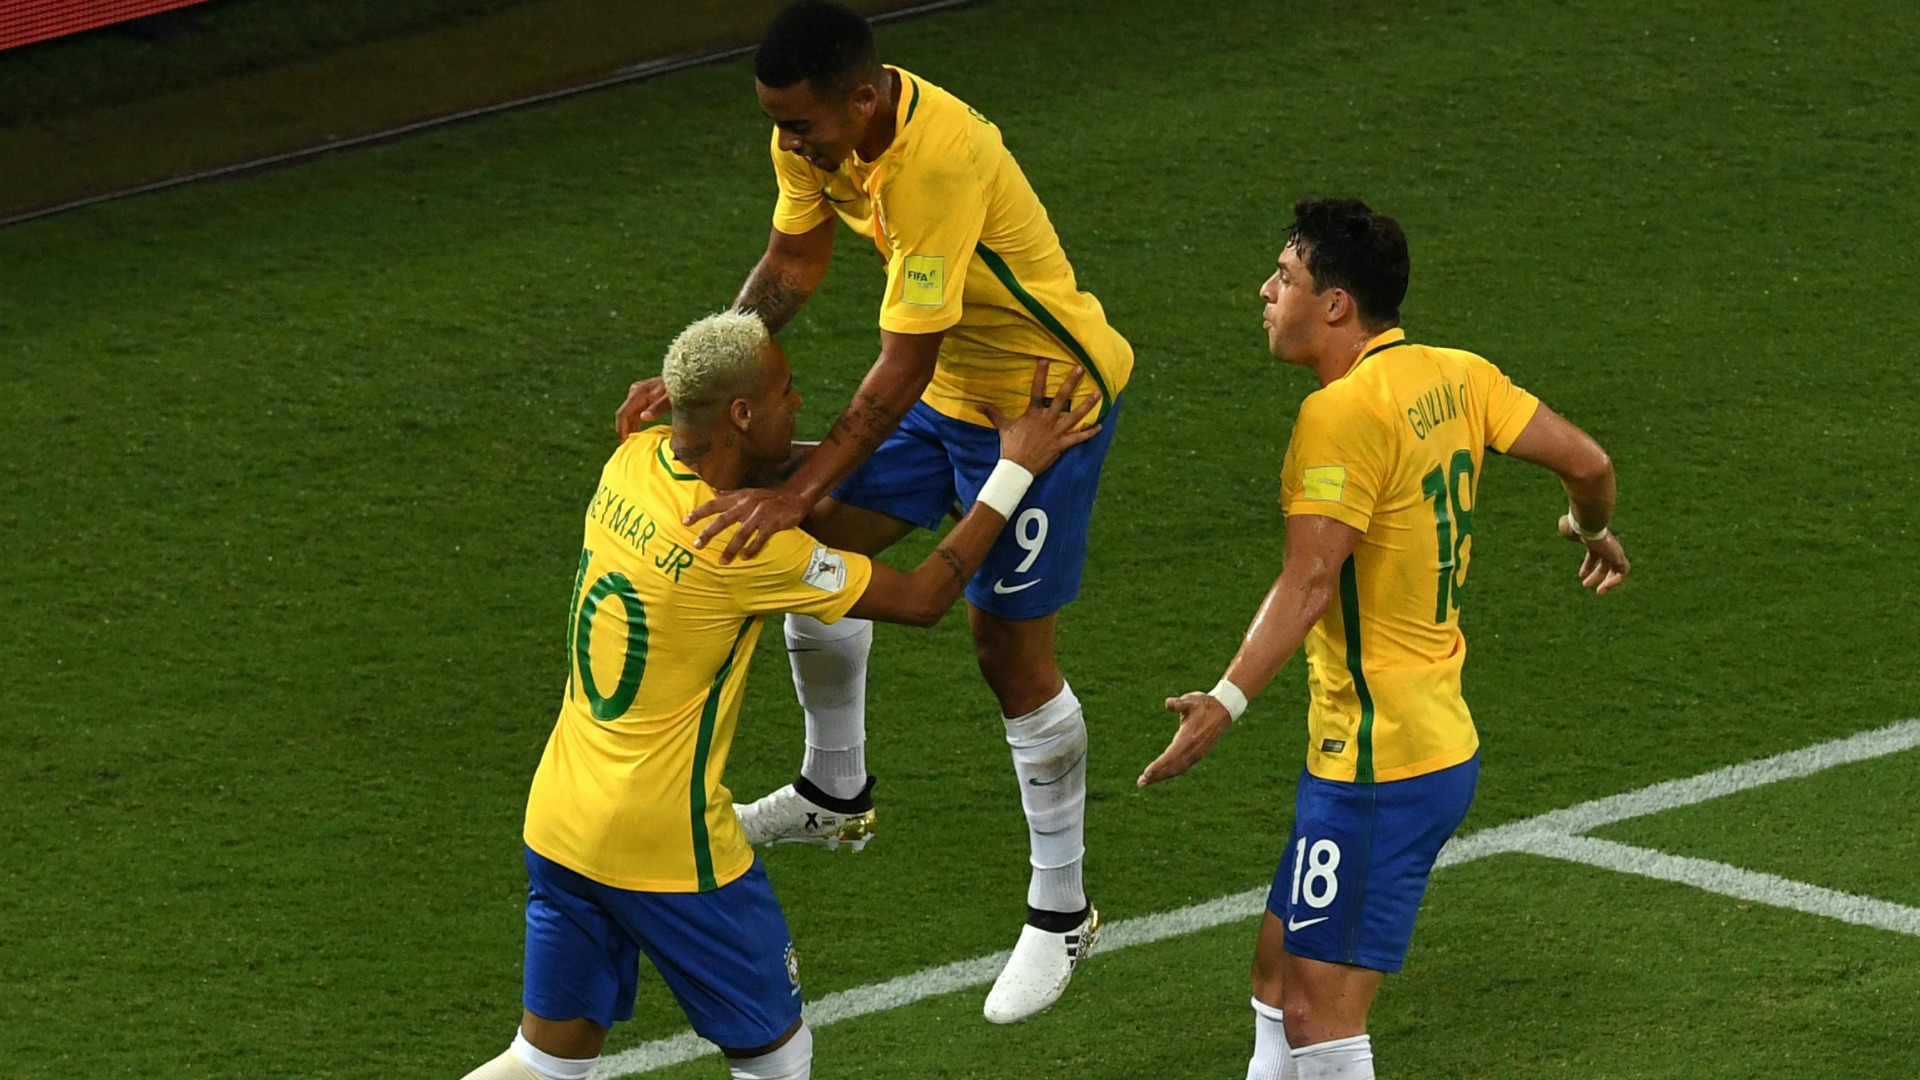 neymar-jesus-giuliano-brasil-x-bolivia-061016_16xkmz9z5jem11xgzvuzp4b01v